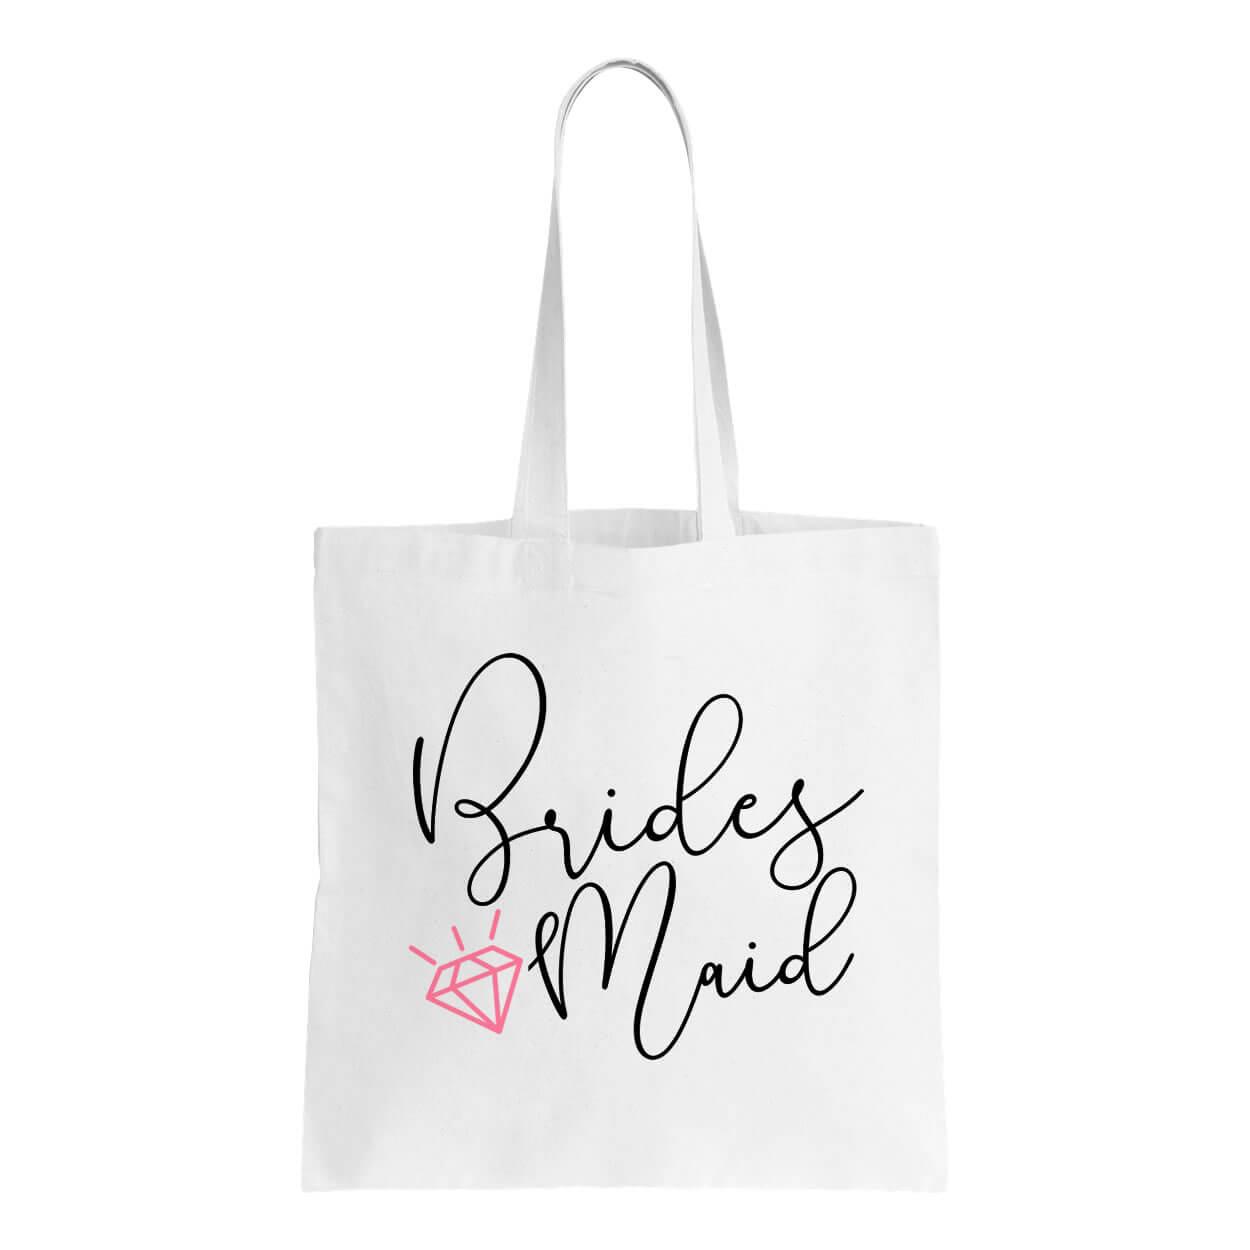 Bride And Bridesmaids Custom Bridal Tote Bag Totes Handmade